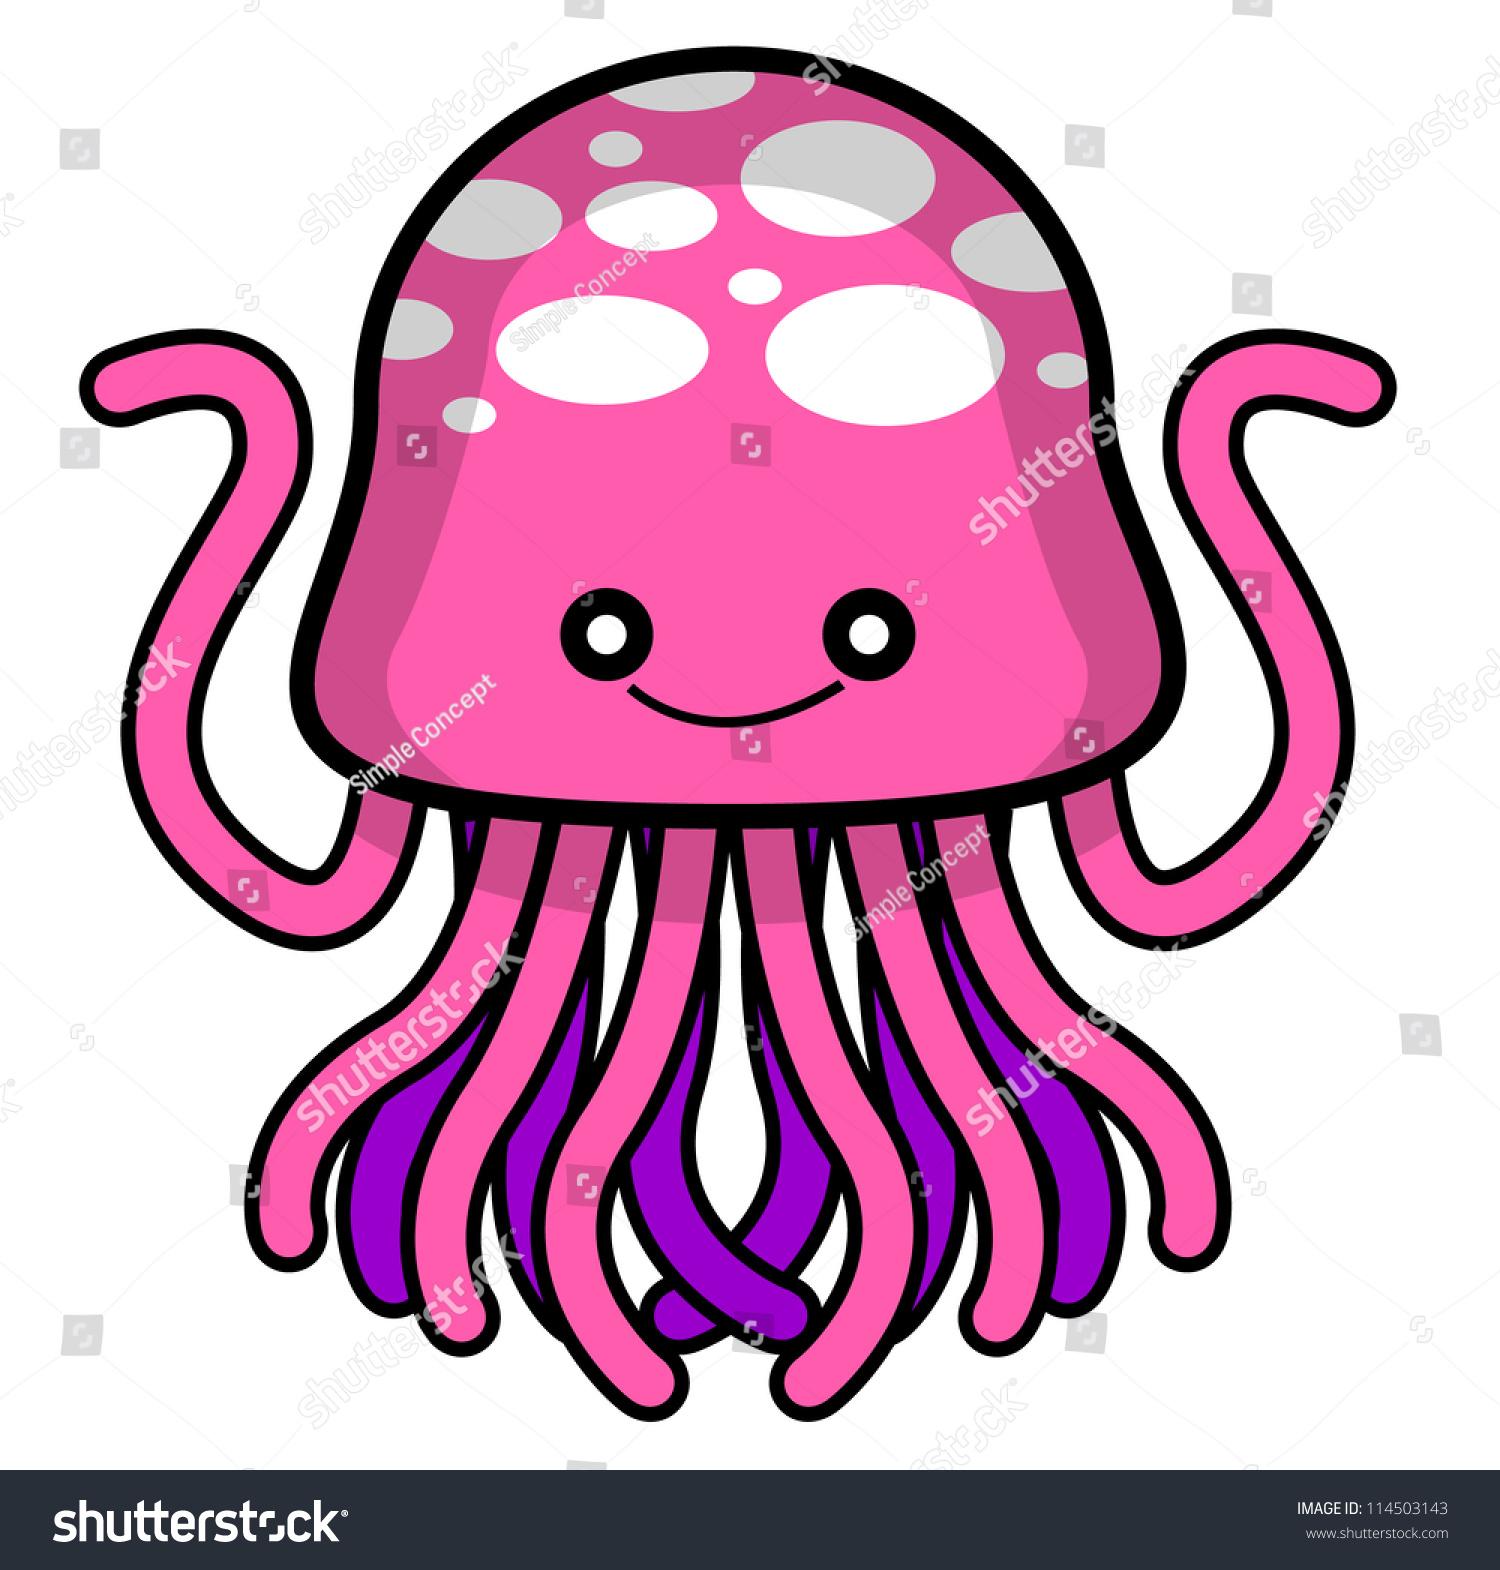 1500x1570 Jelly Fish Clip Art